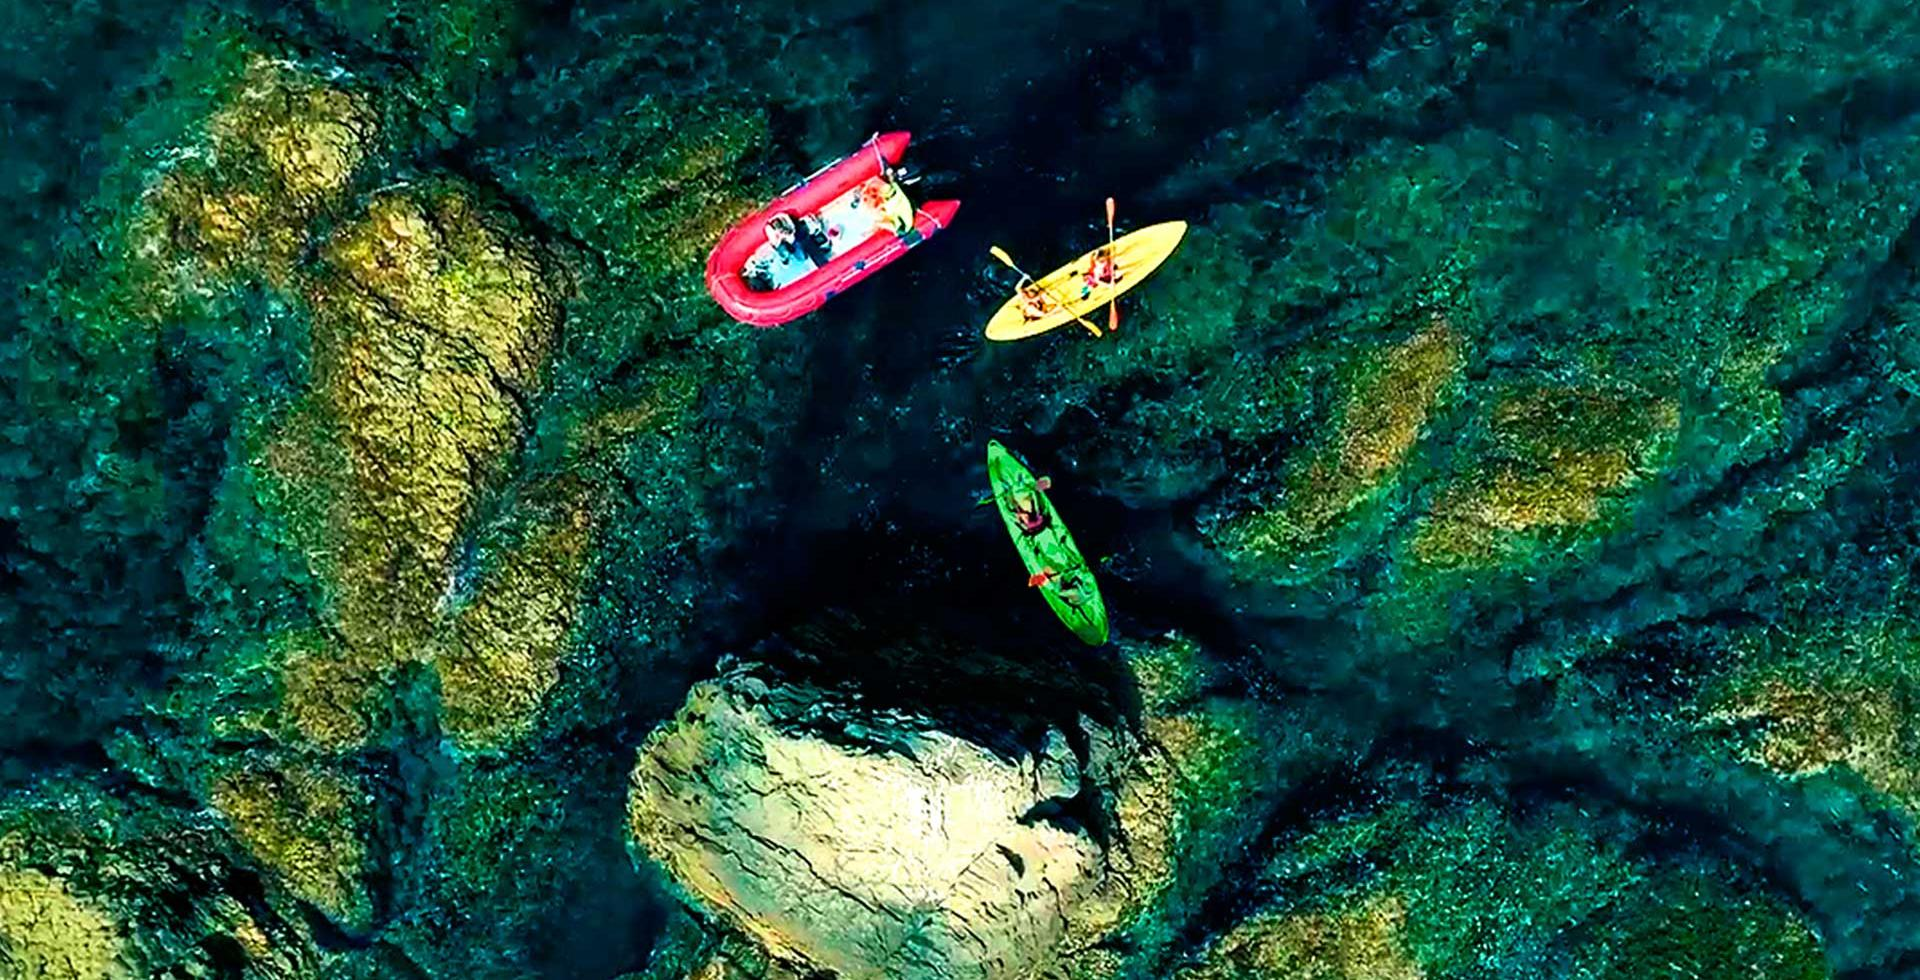 Cabo de Gata is Adventure